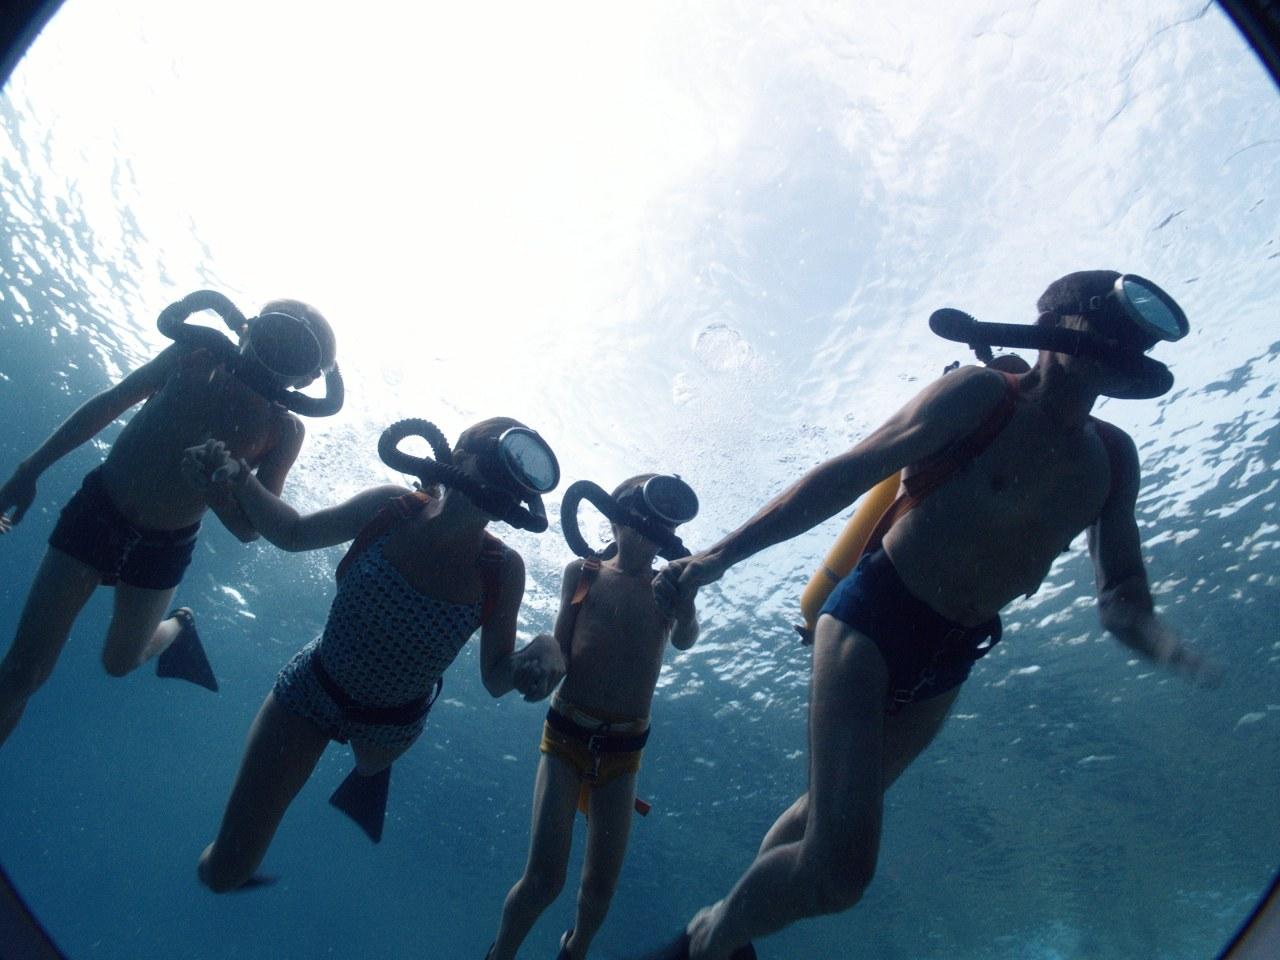 Jacques - Entdecker der Ozeane - Bild 6